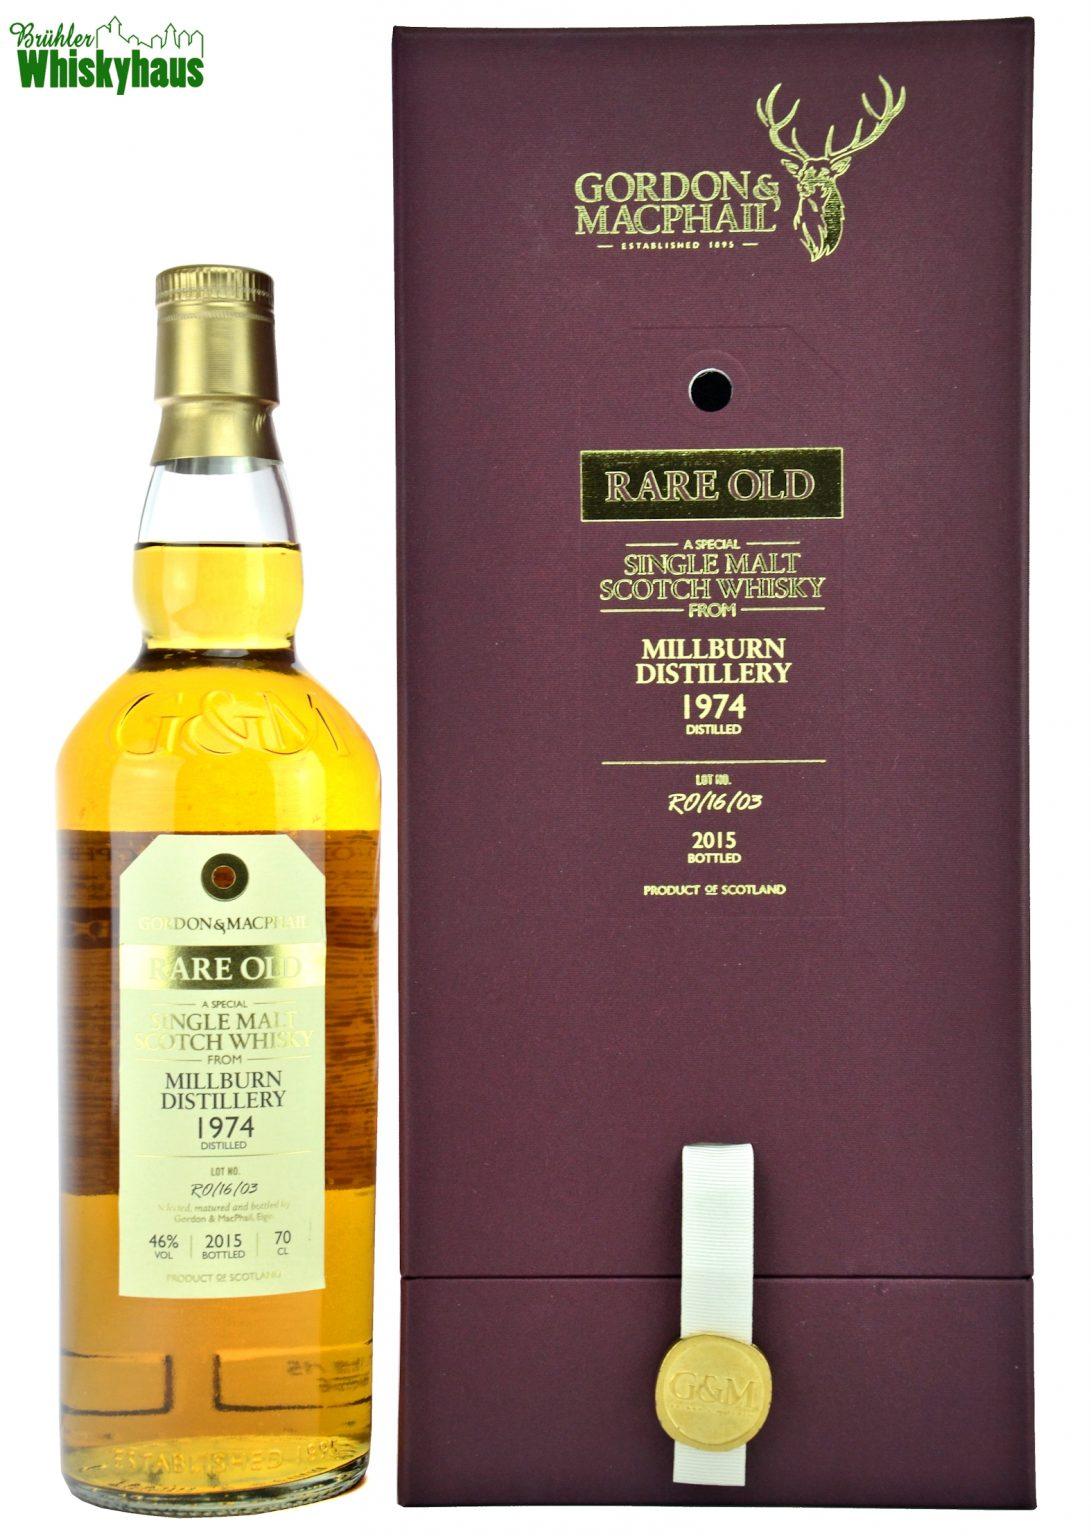 Millburn Vintage 1974 - 41 Jahre - Refill Sherry Cask No. RO/16/03 - Gordon & MacPhail - Single Malt Scotch Whisky